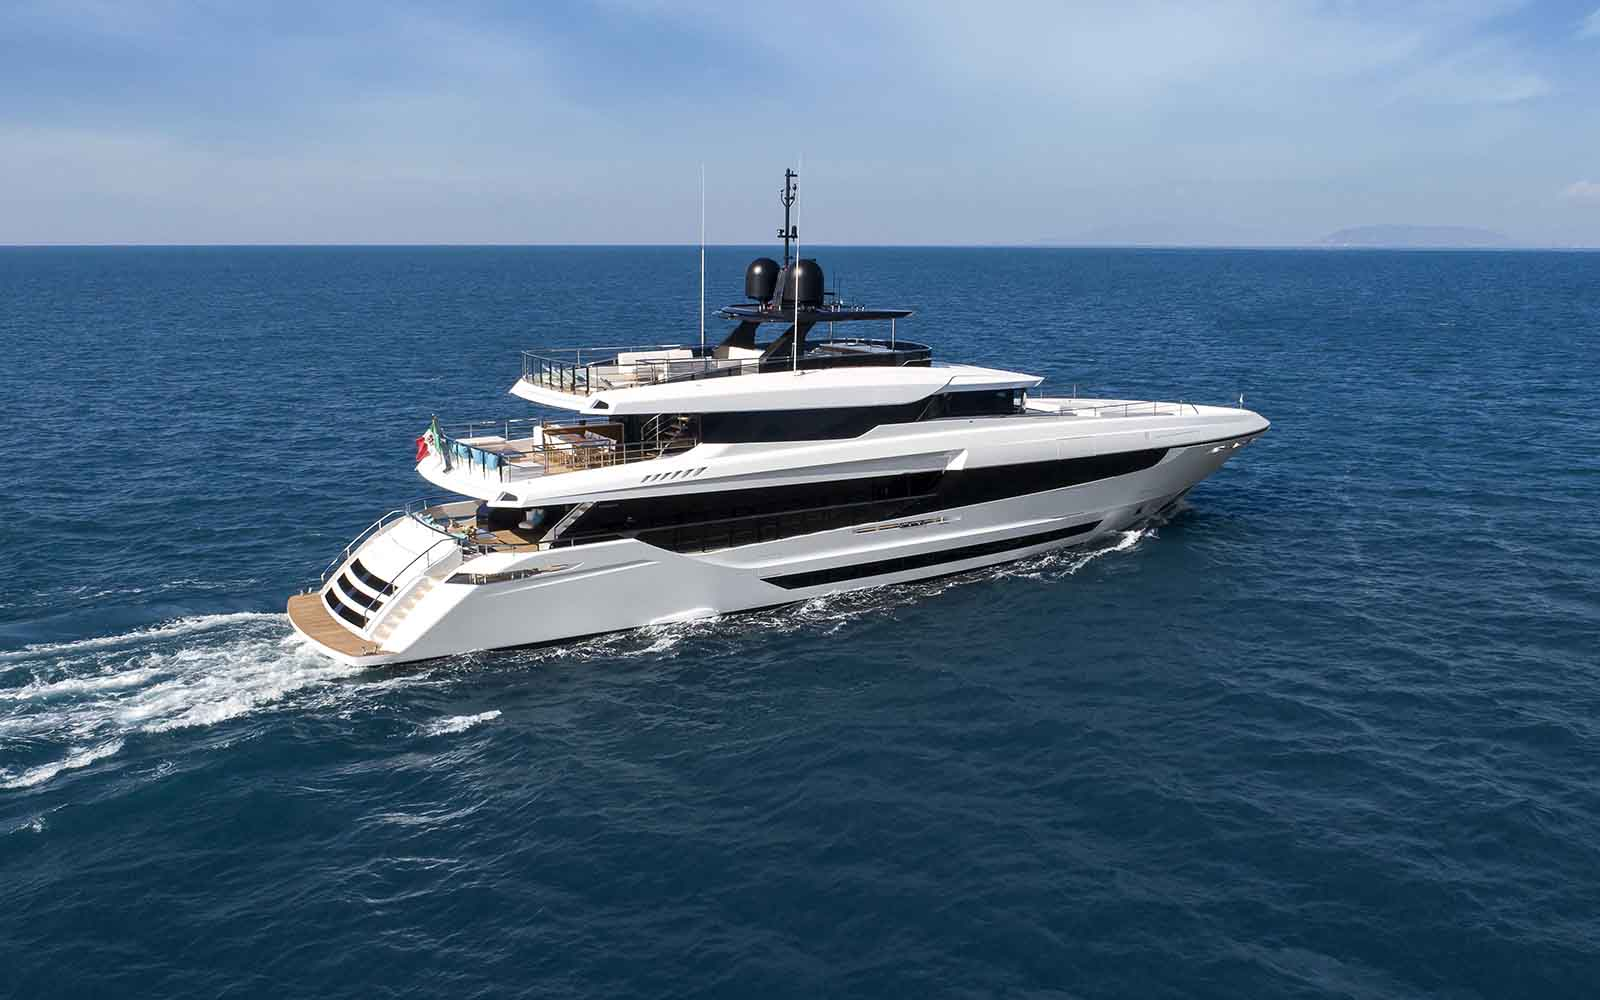 Mangusta Oceano 43 - boat shopping